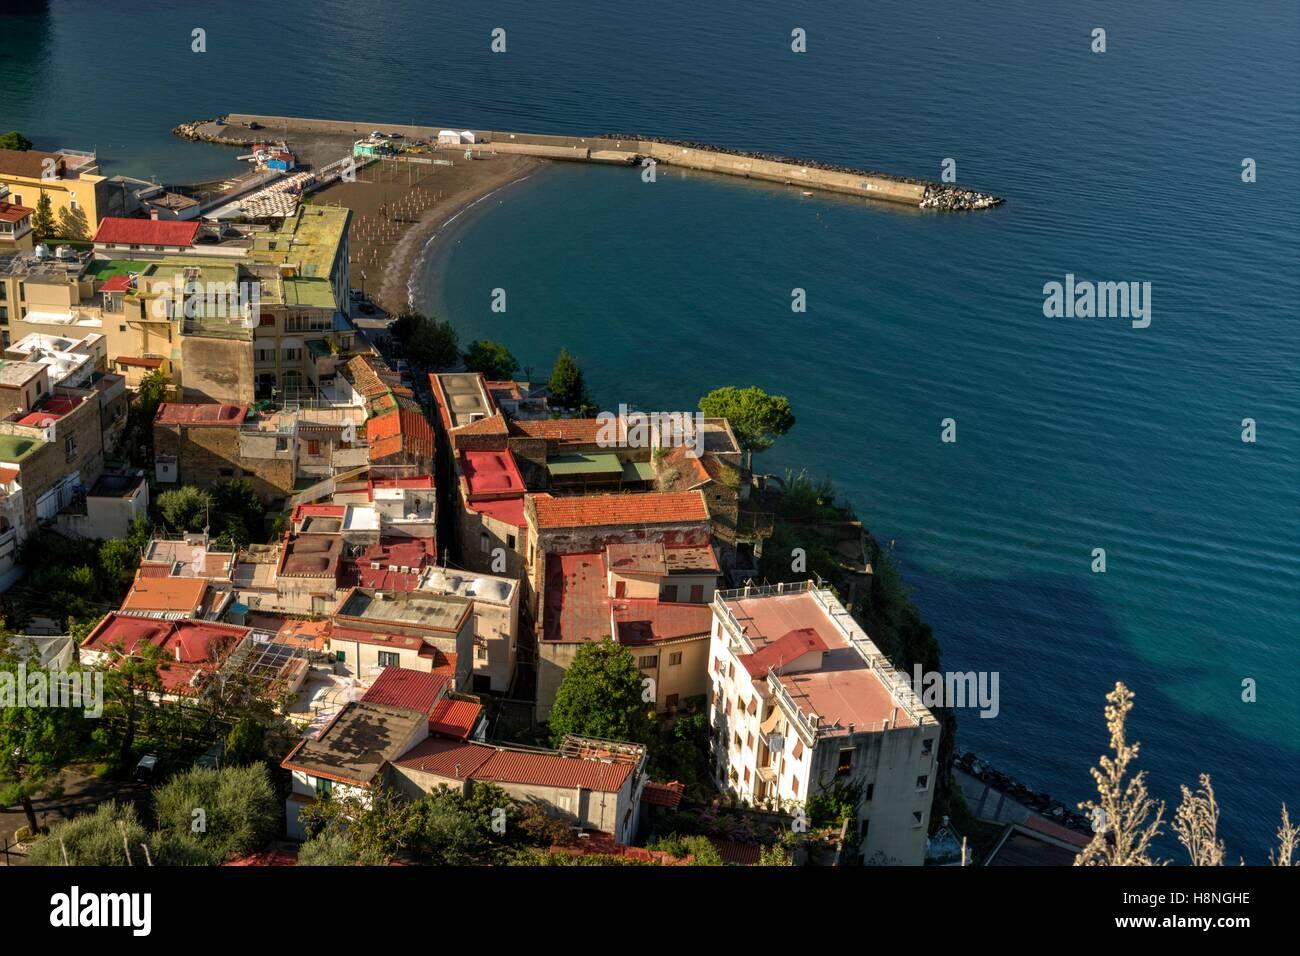 Meta harbour, Italy - Stock Image